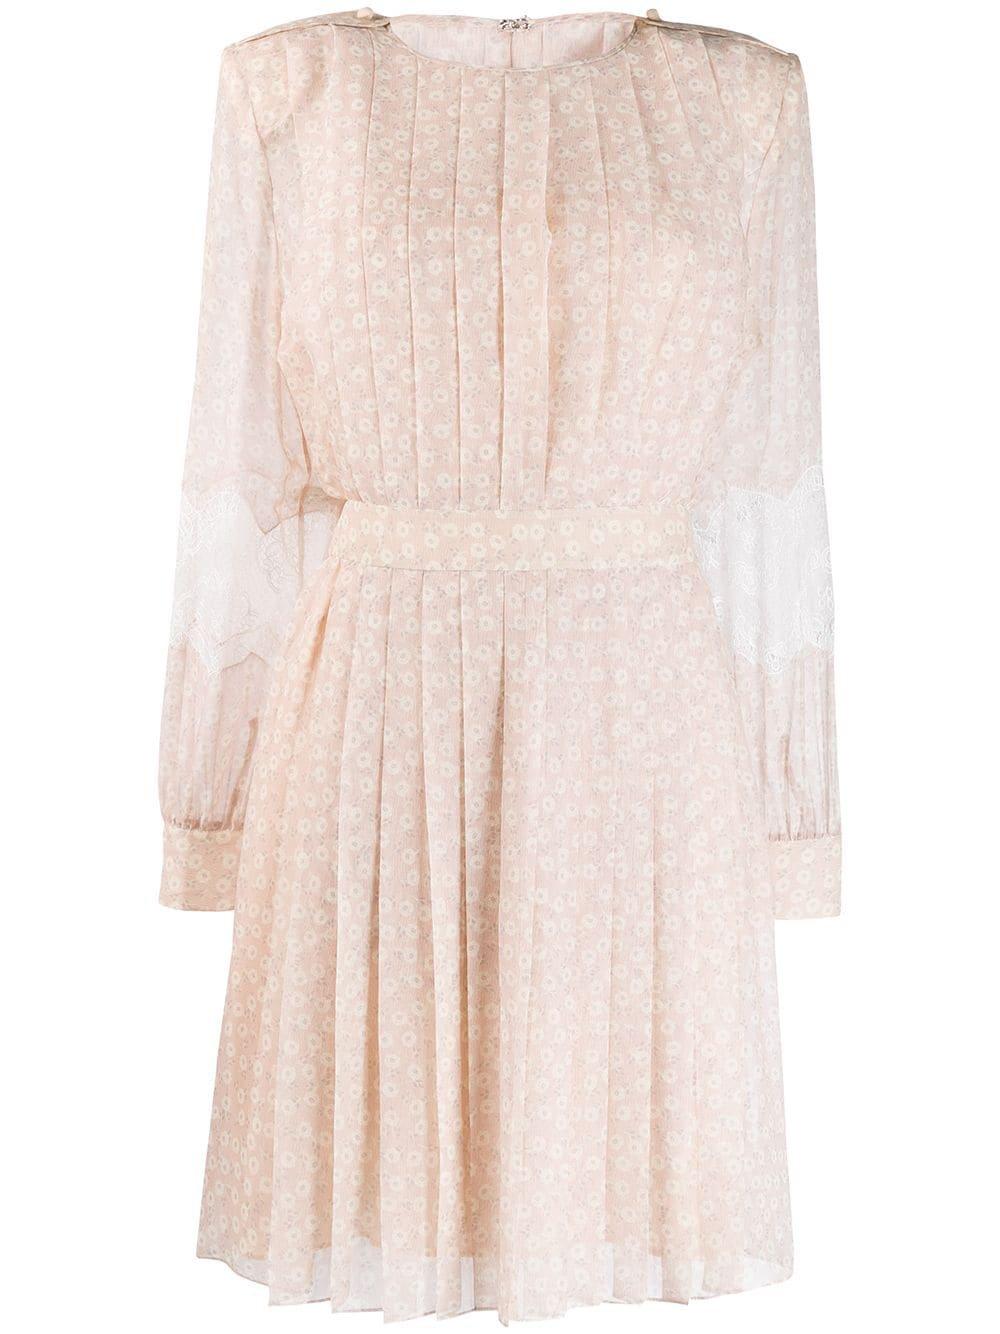 Fendi Lace Flared Pleated Dress | Farfetch.com